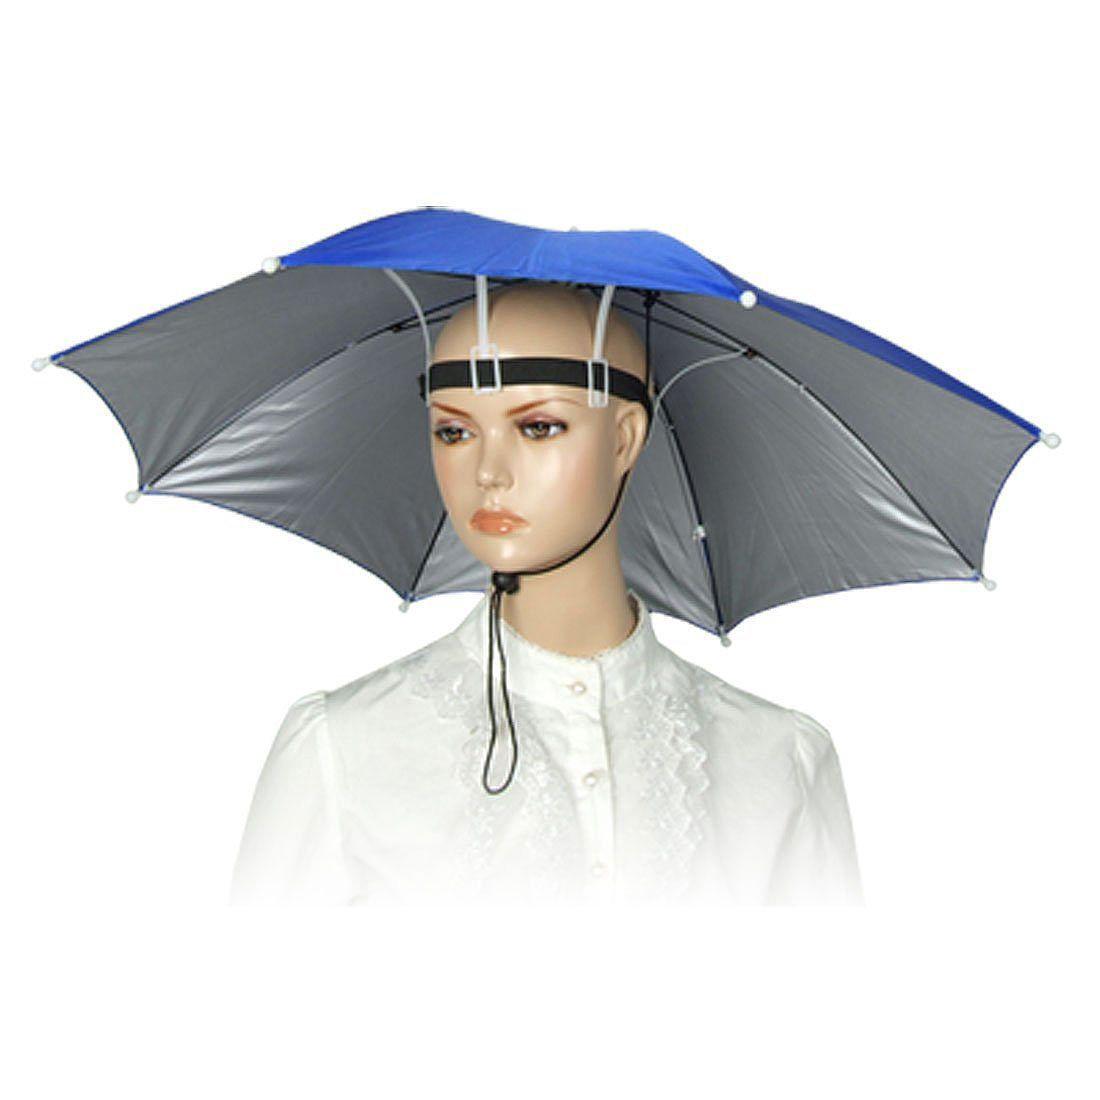 4665be21c38ee 3.8AUD - Elastic Headband Metal Frame Hands Free Nylon Umbrella Hat Blue Hy   ebay  Fashion